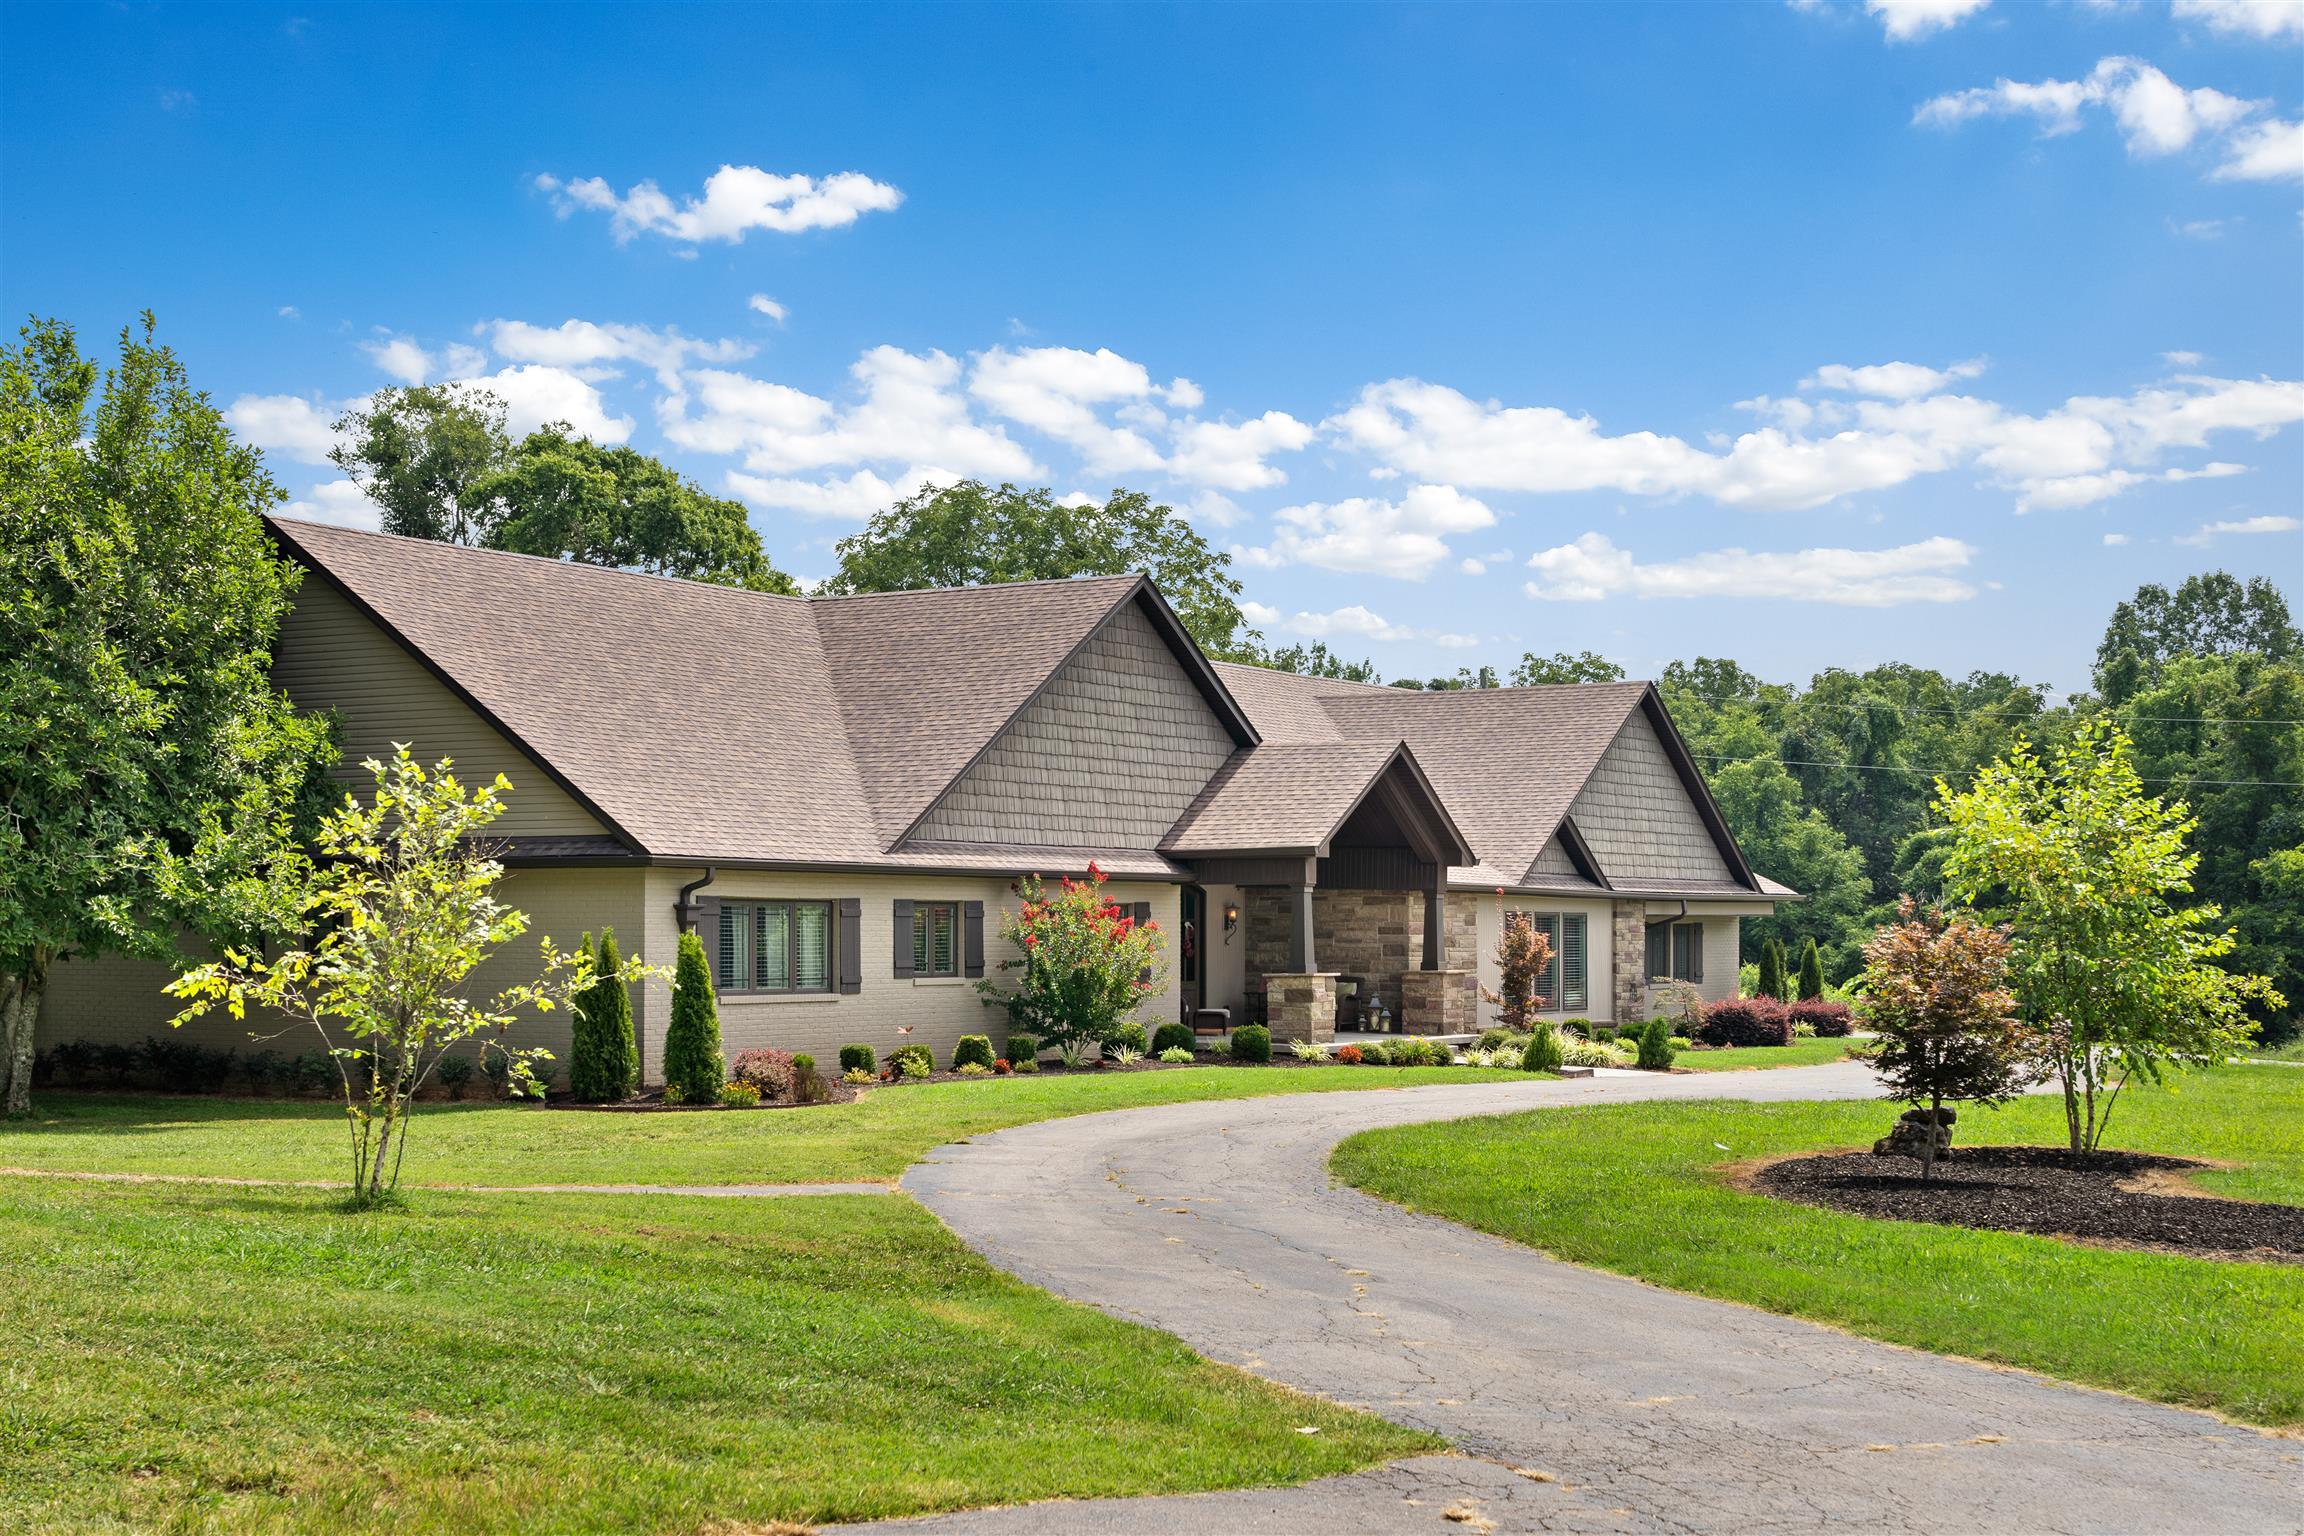 2385 Old Ashland City Rd, Clarksville, TN 37043 - Clarksville, TN real estate listing